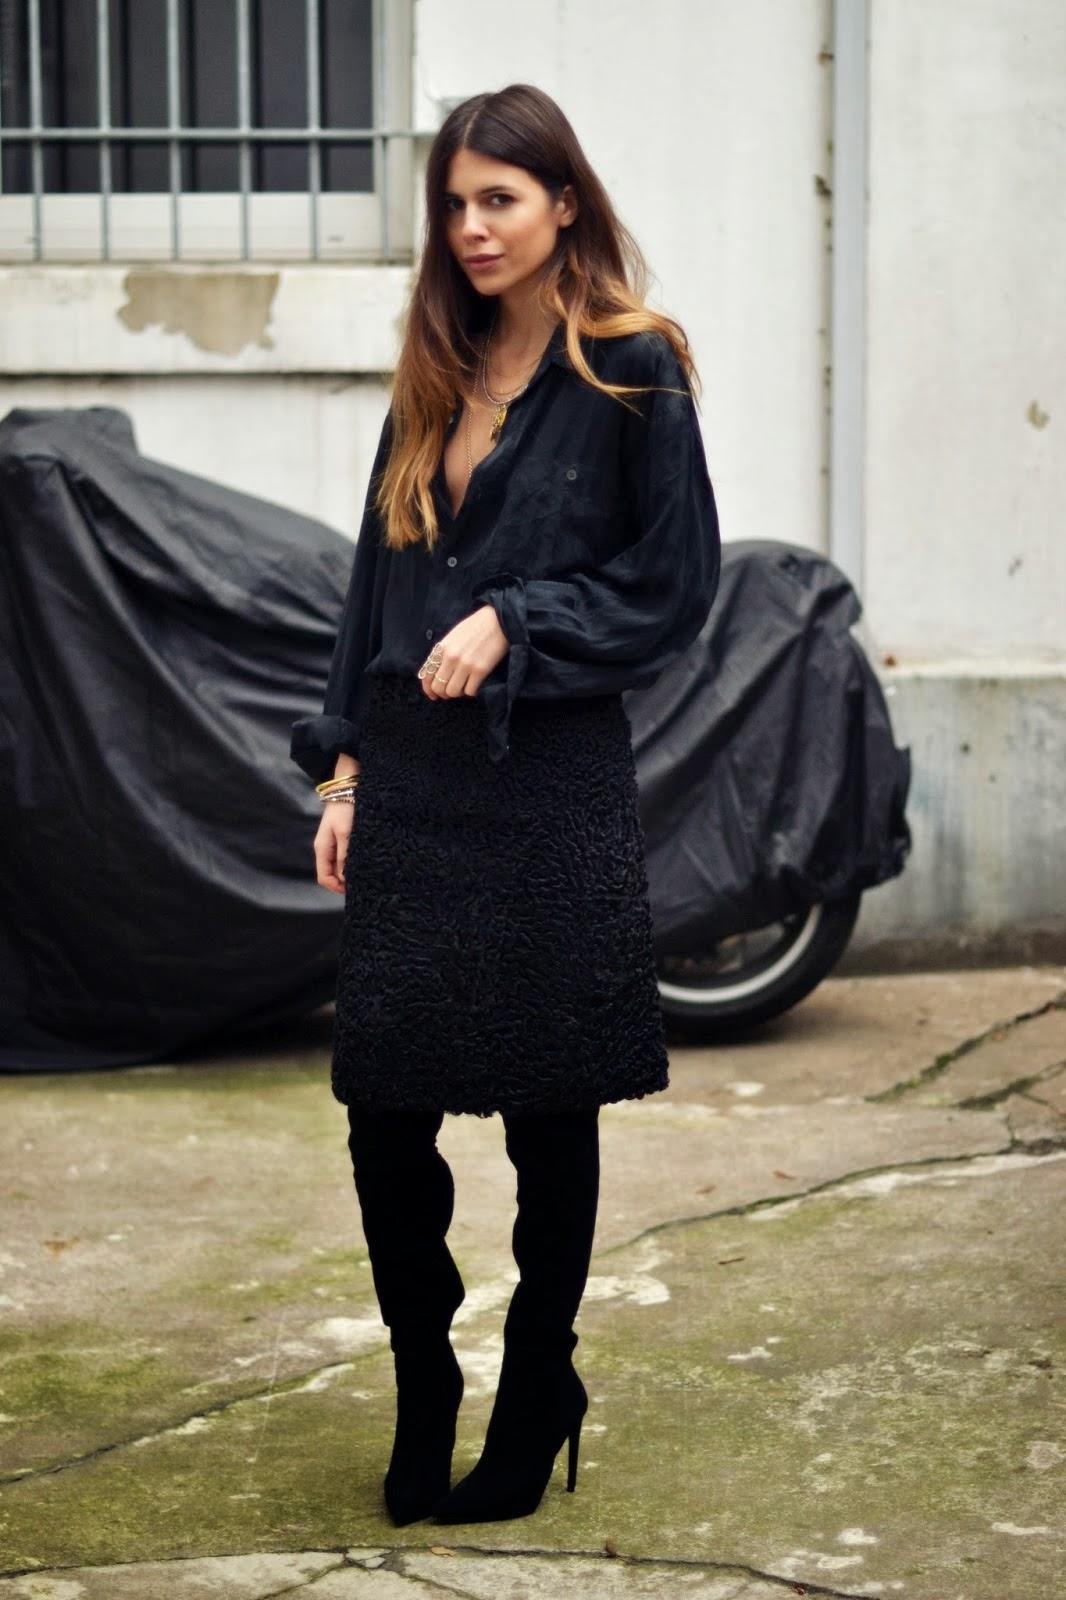 maja wyh waring black clothes